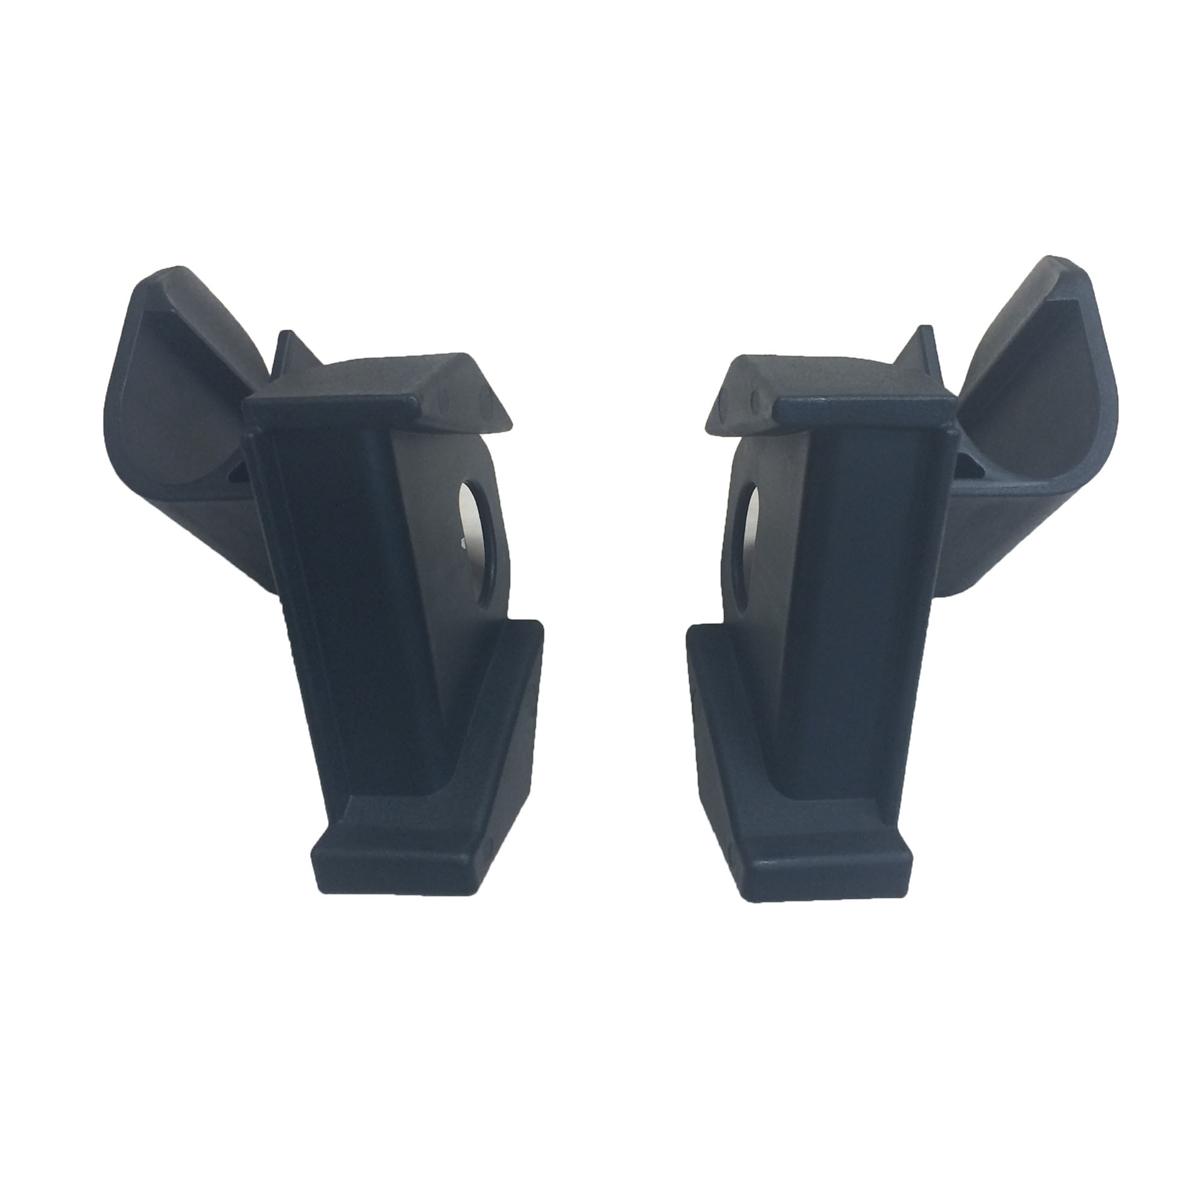 Combi Shuttle Car Seat Replacement Parts